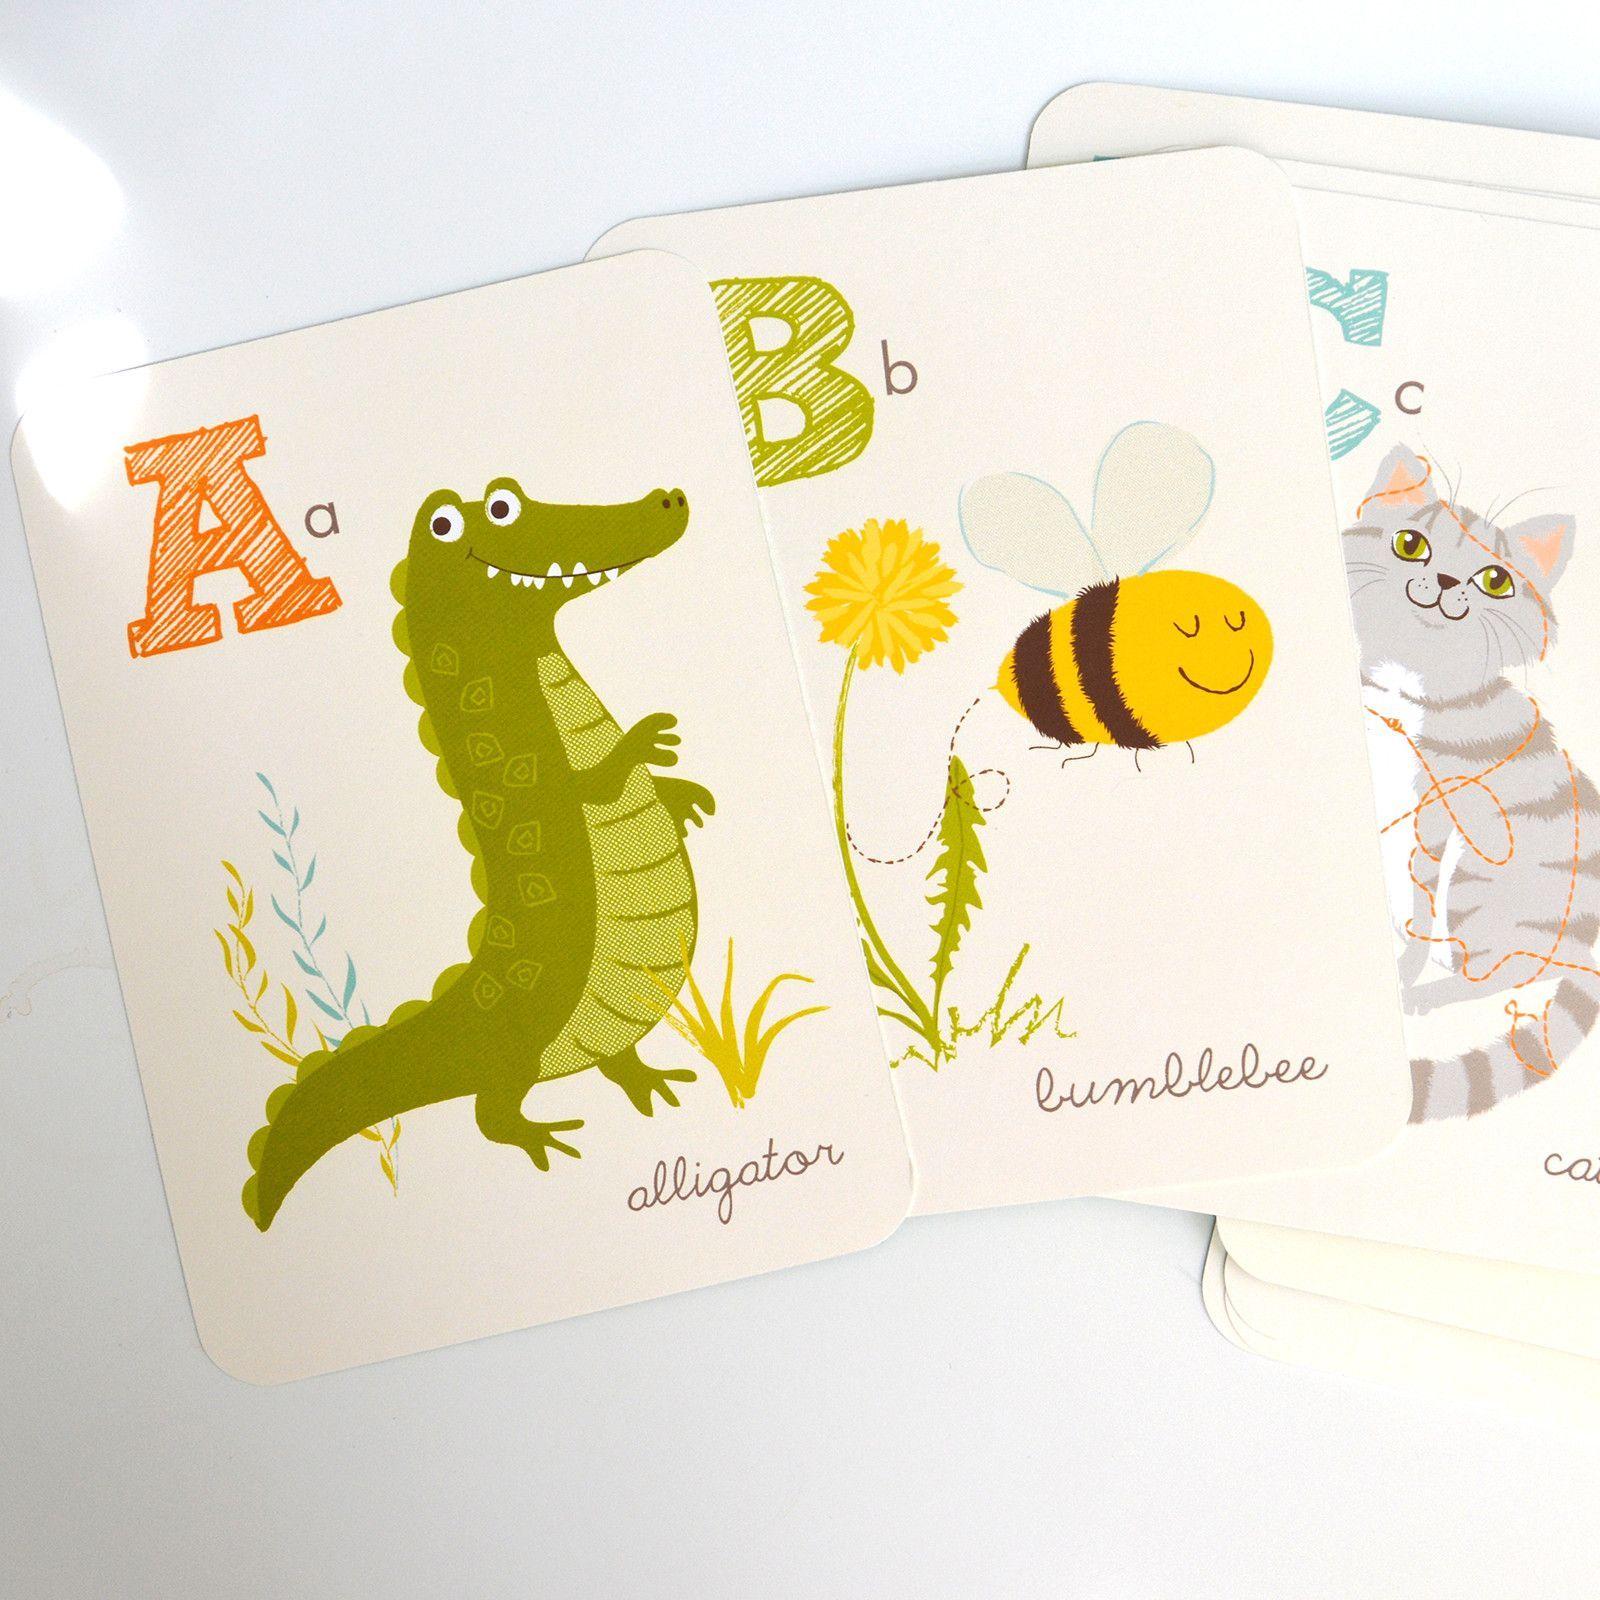 ABC | Alligator to Zebra | Alligators and Products